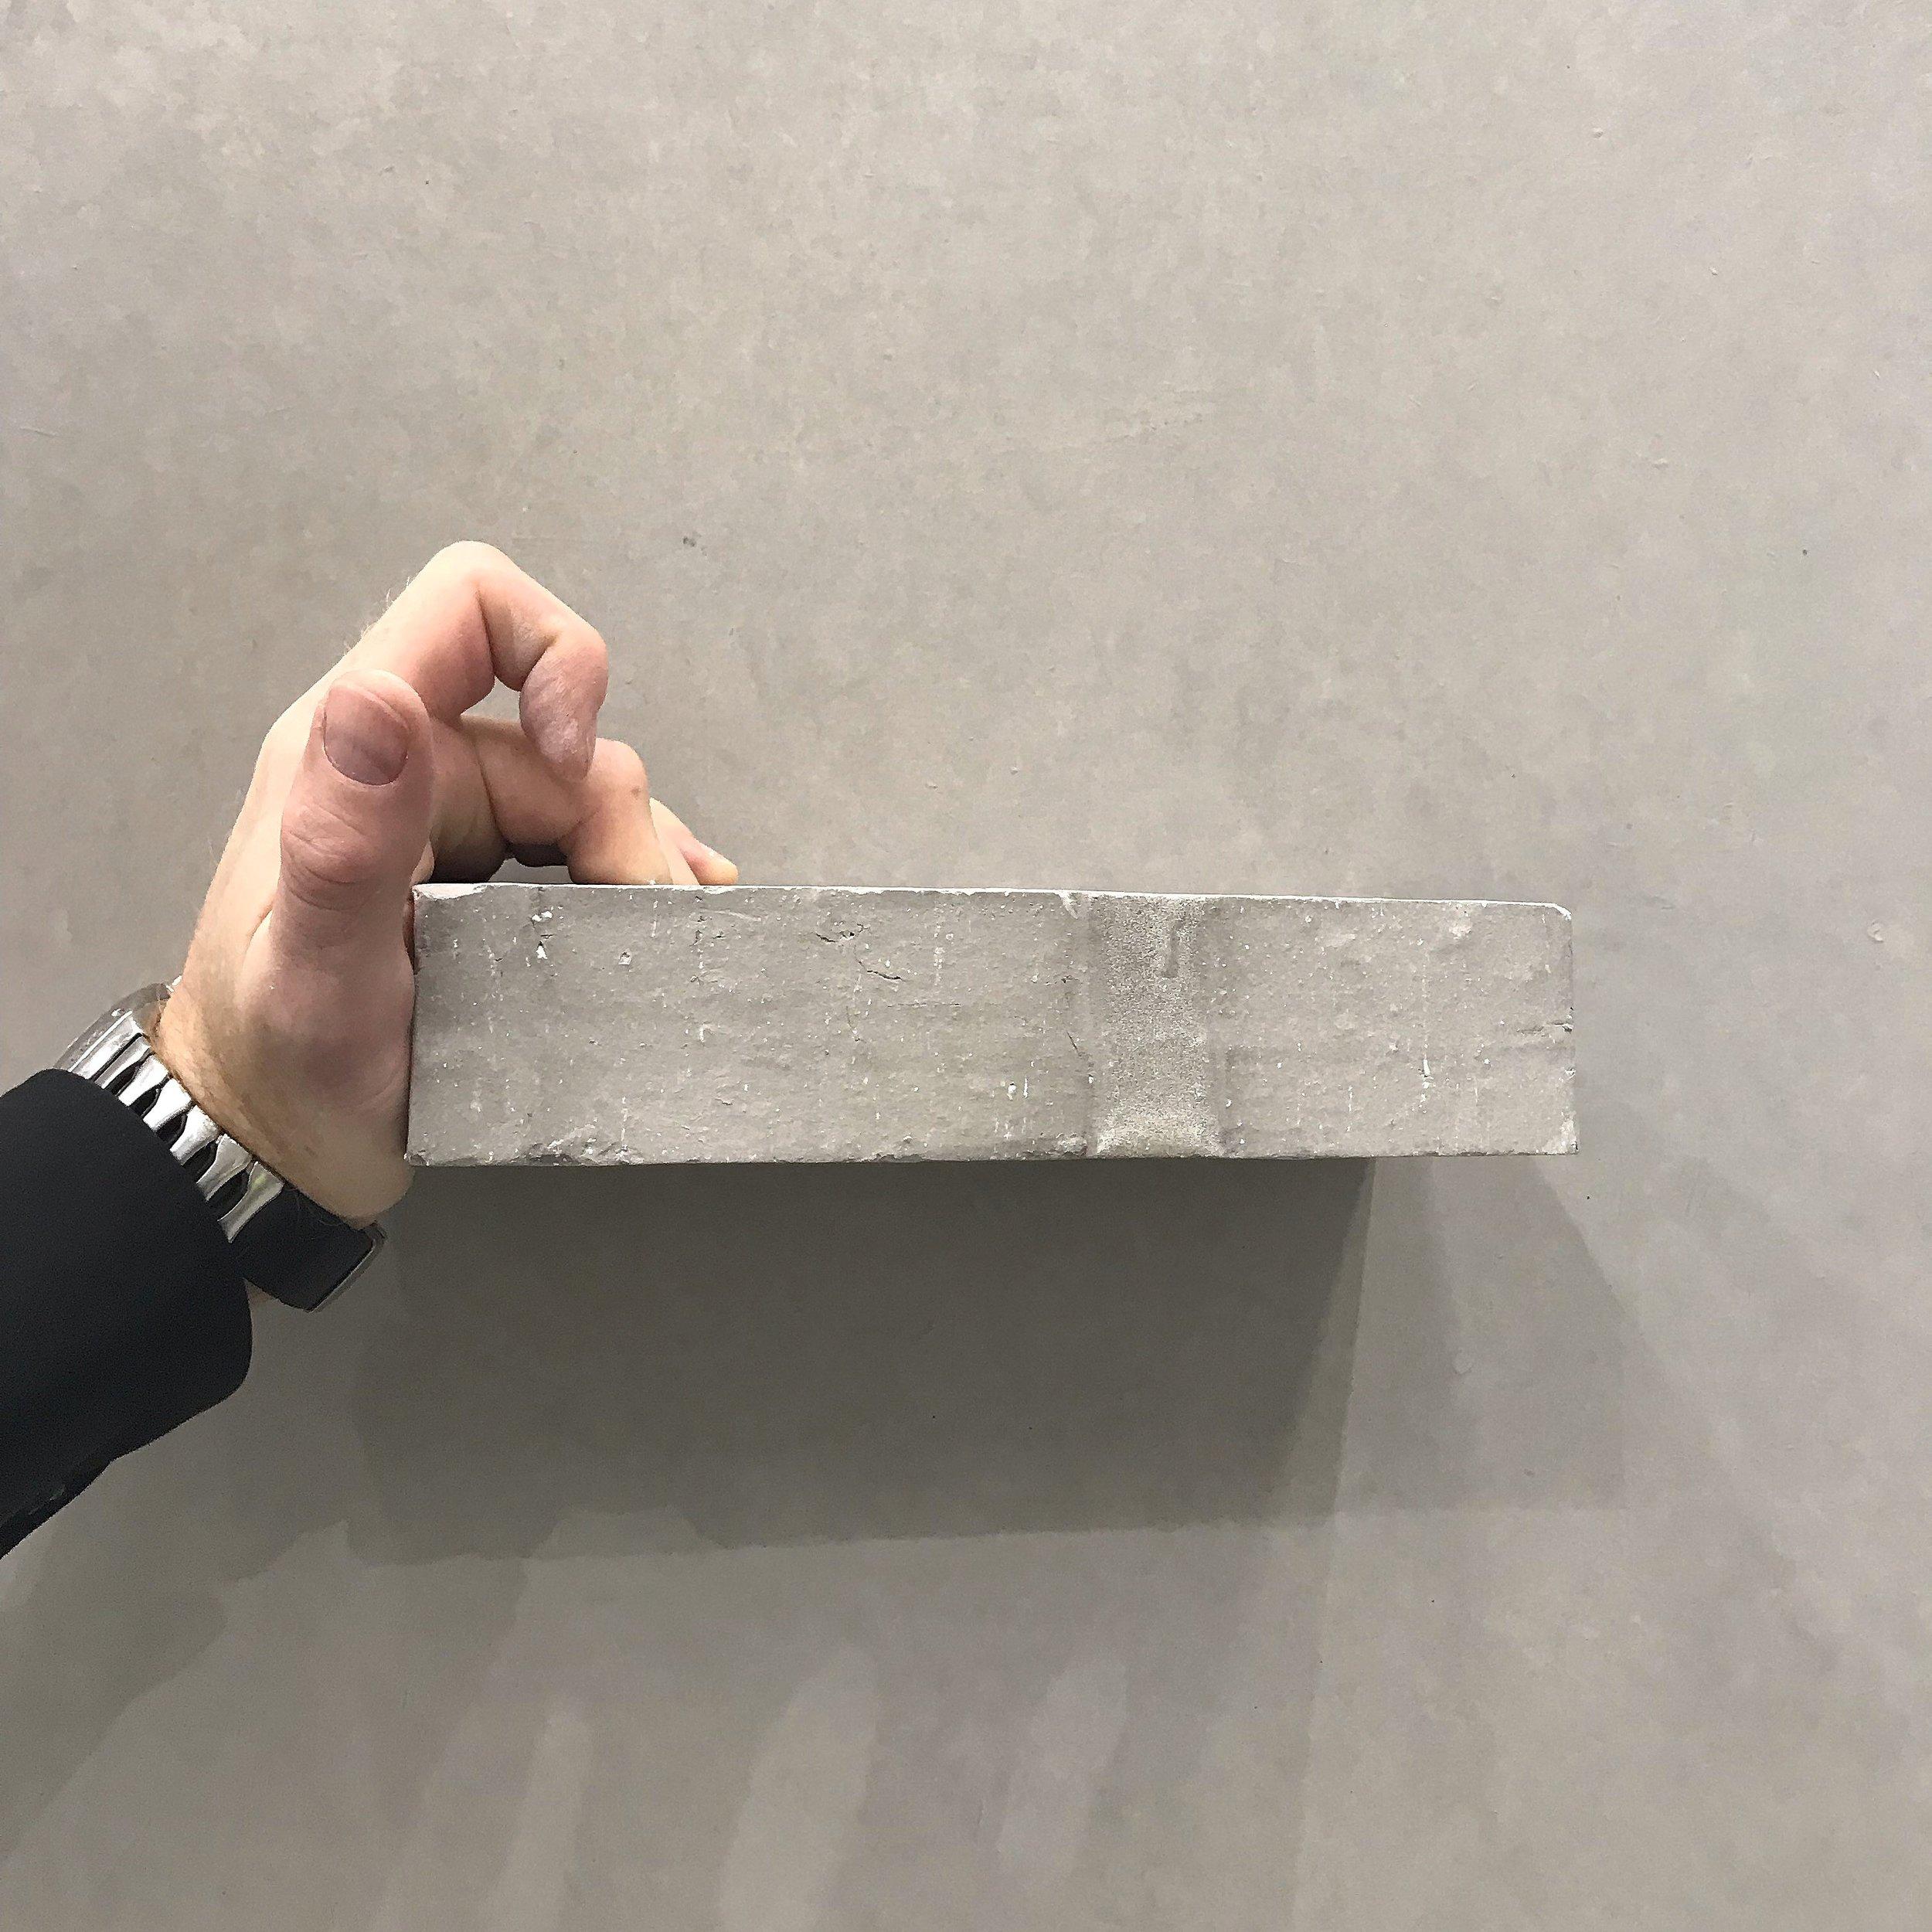 Tilt wall & brick.jpg